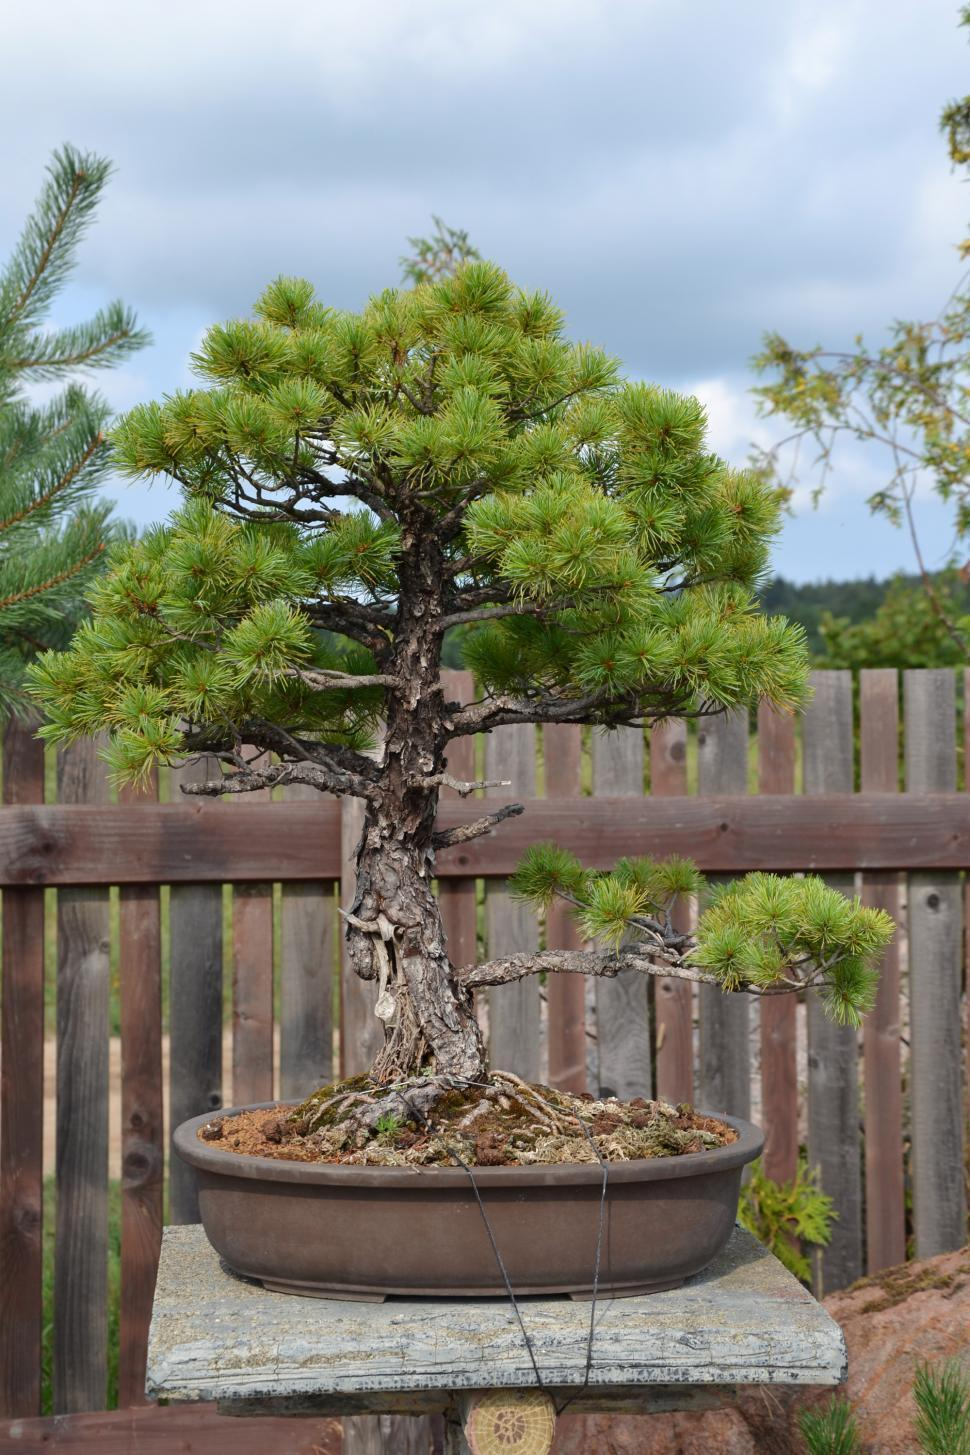 Download Free Stock Photo of Bonsai pine